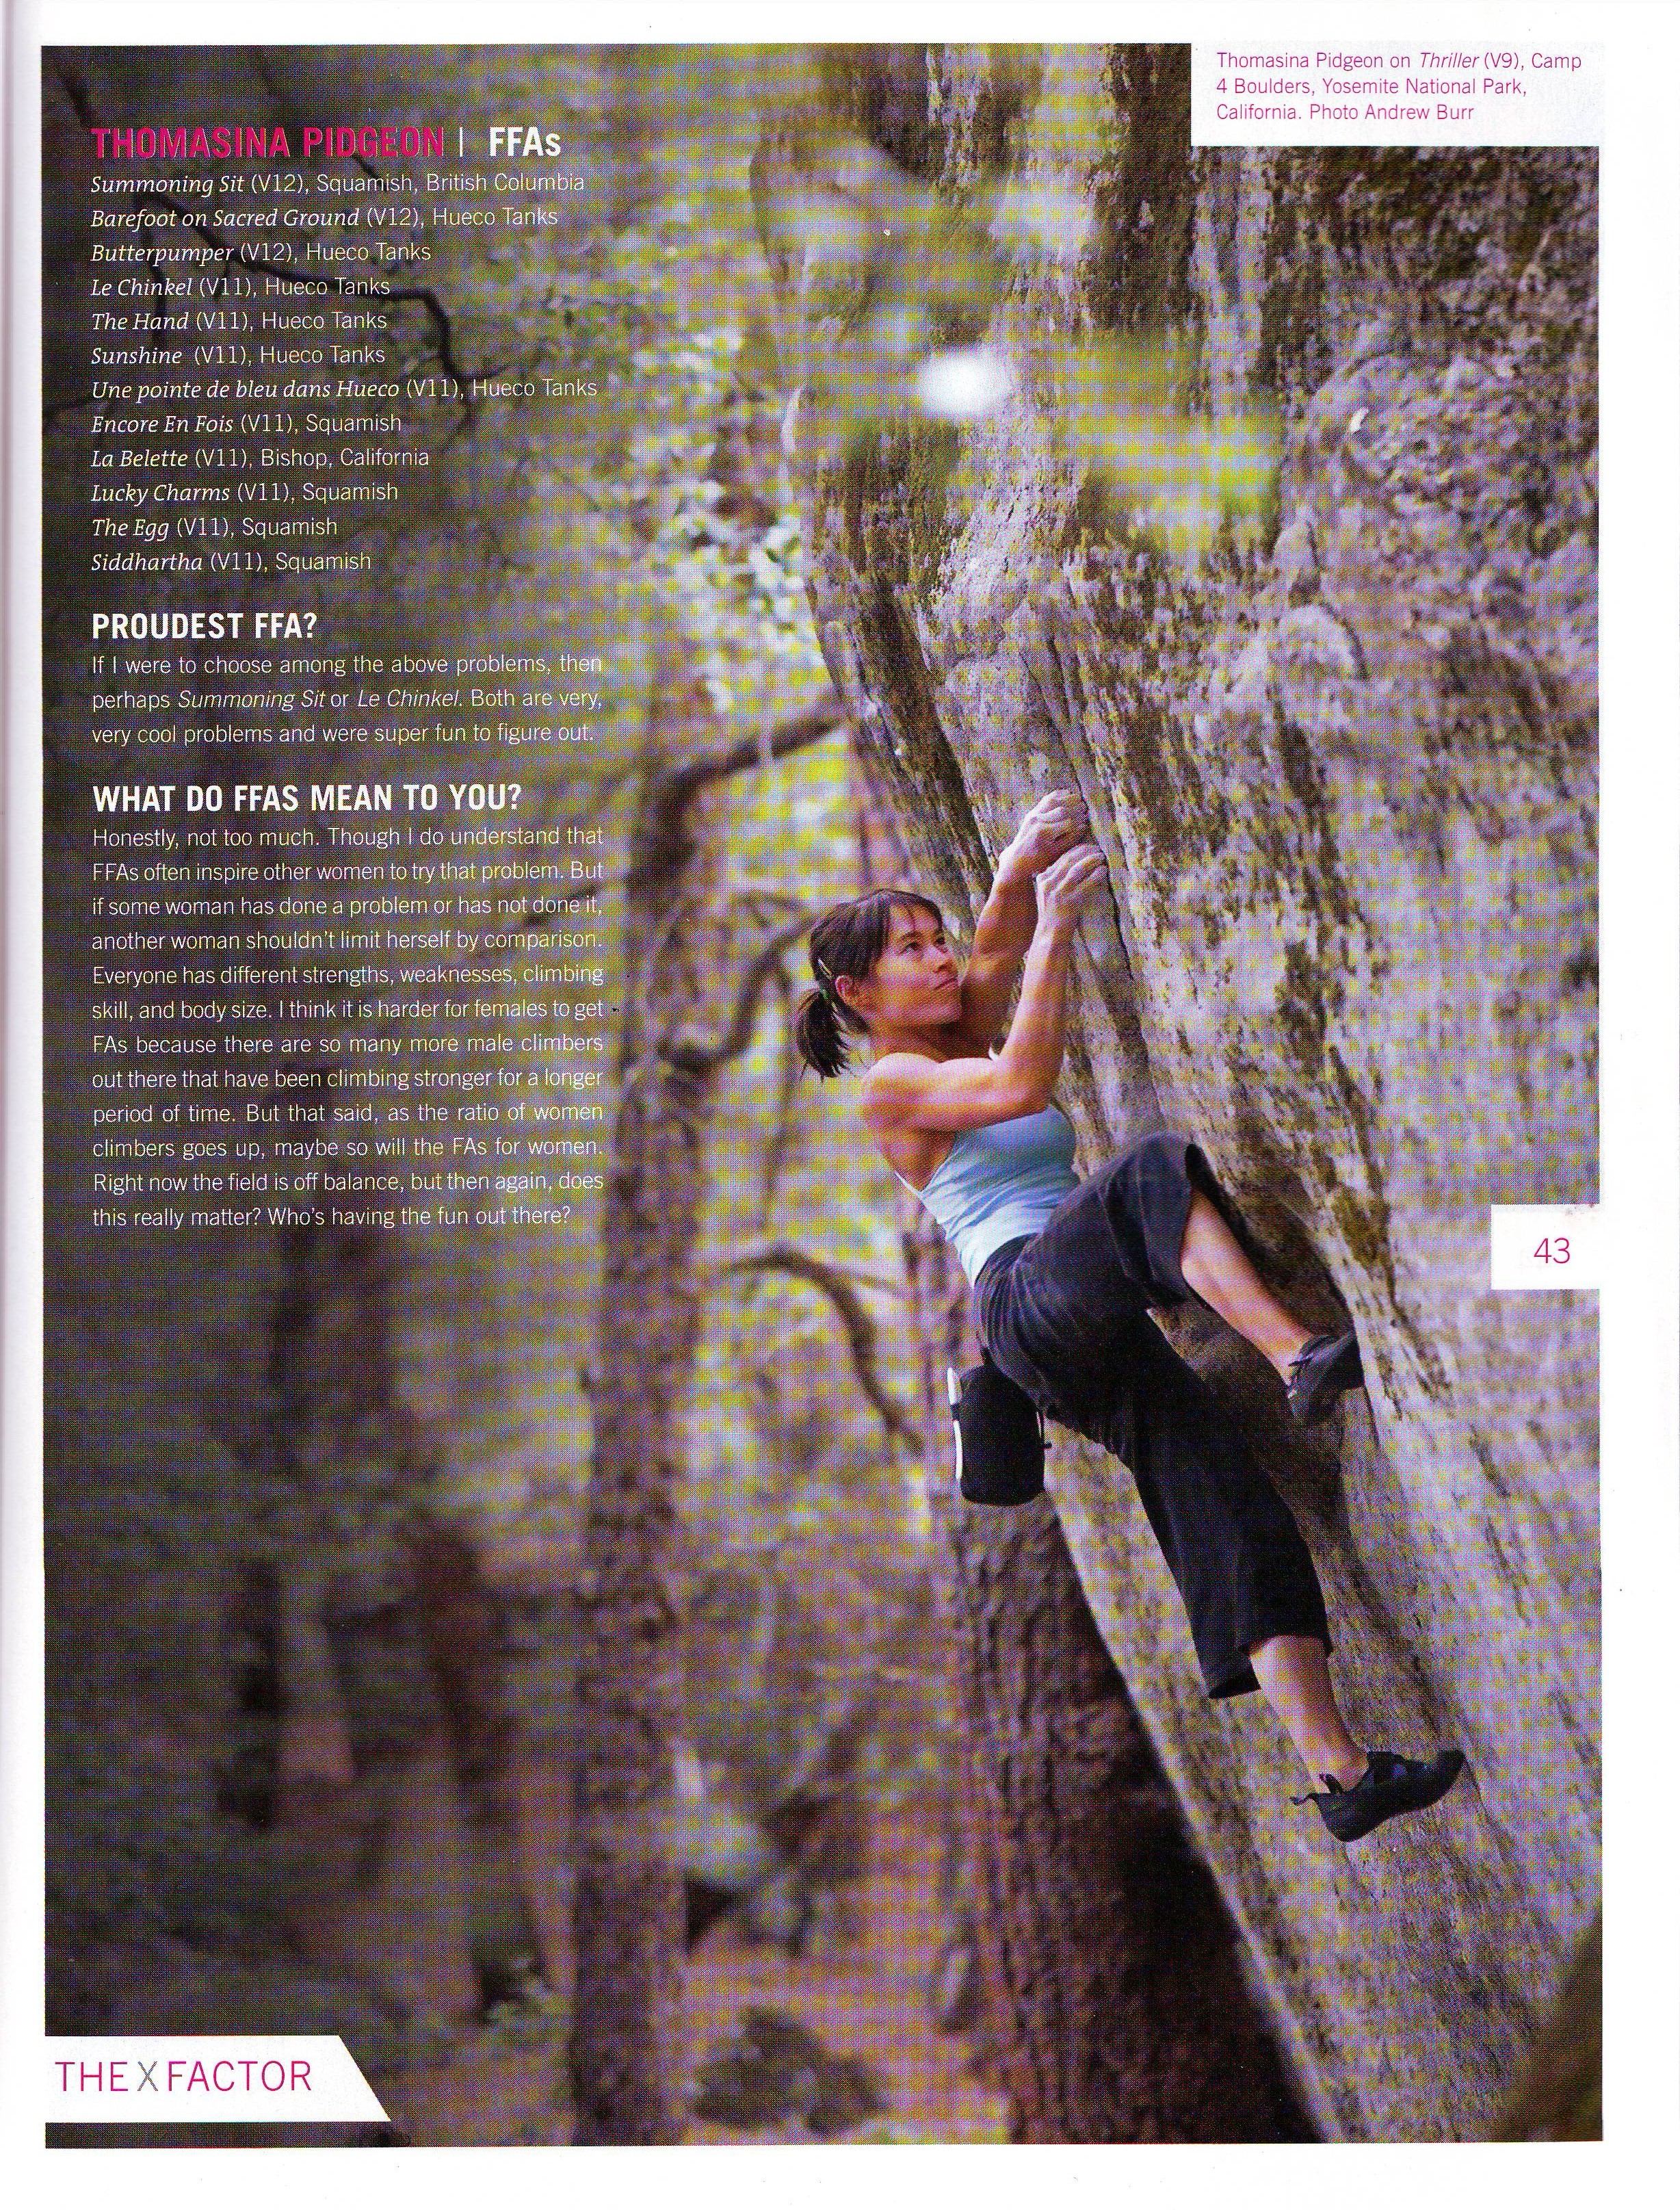 yosemite valley bouldering, v10 women climber, climbing coach